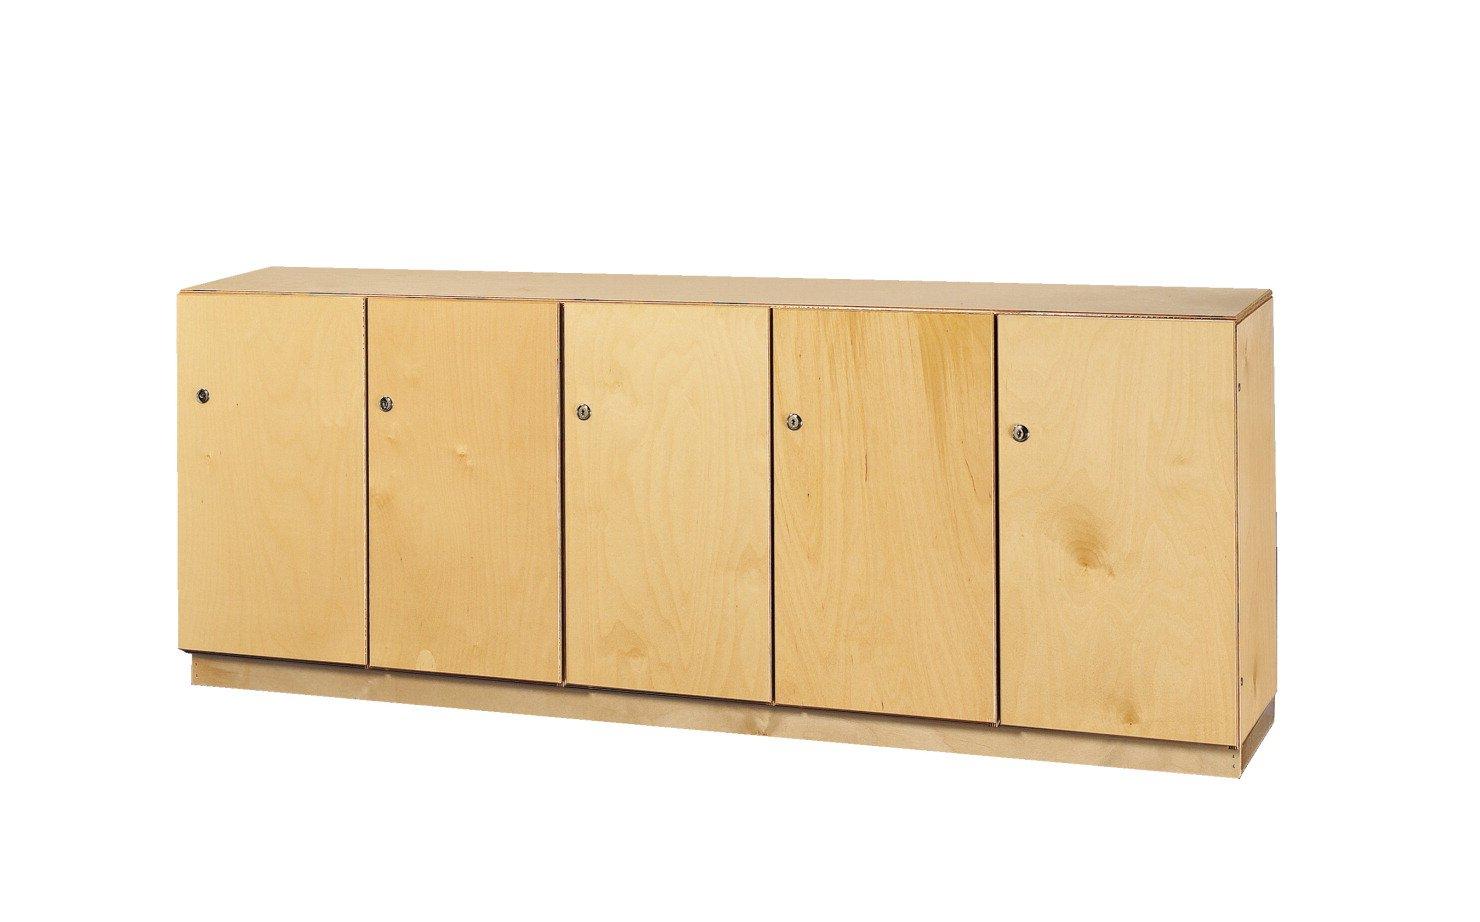 Childcraft 204154 5-Section Stacking and Locking Storage Locker, Birch Veneer Panel, 59-1/2'' x 14-1/2 x 23-3/4'', Natural Wood Tone